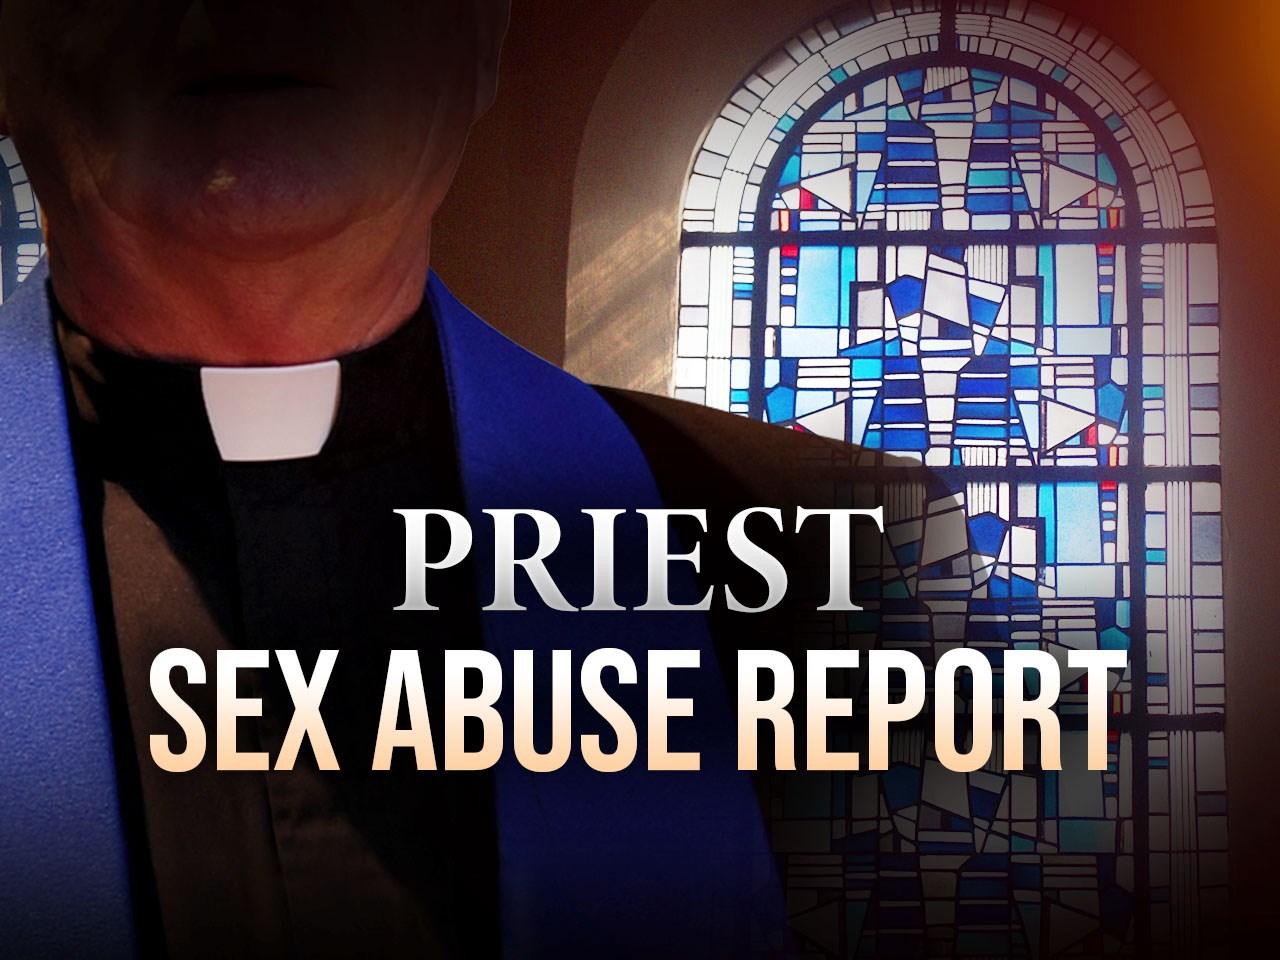 PRIEST SEX ABUSE VMOT_1537587150217.jpg.jpg